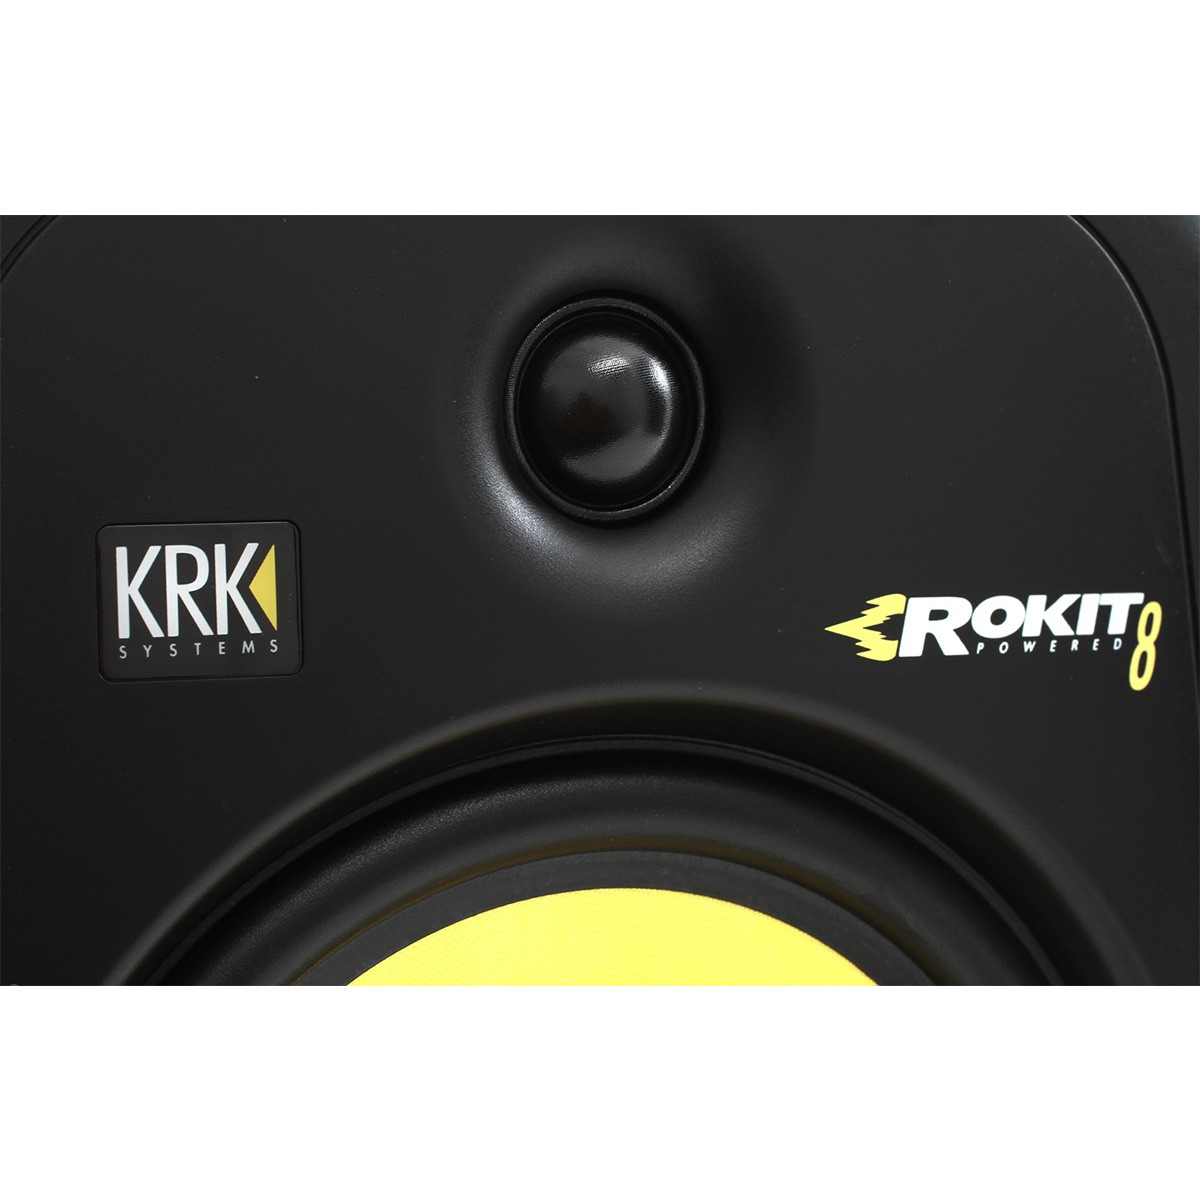 Krk RP8 G3 Rokit Powered Monitor de Áudio Referencia para Estudio, Preto, 220v, Unidade